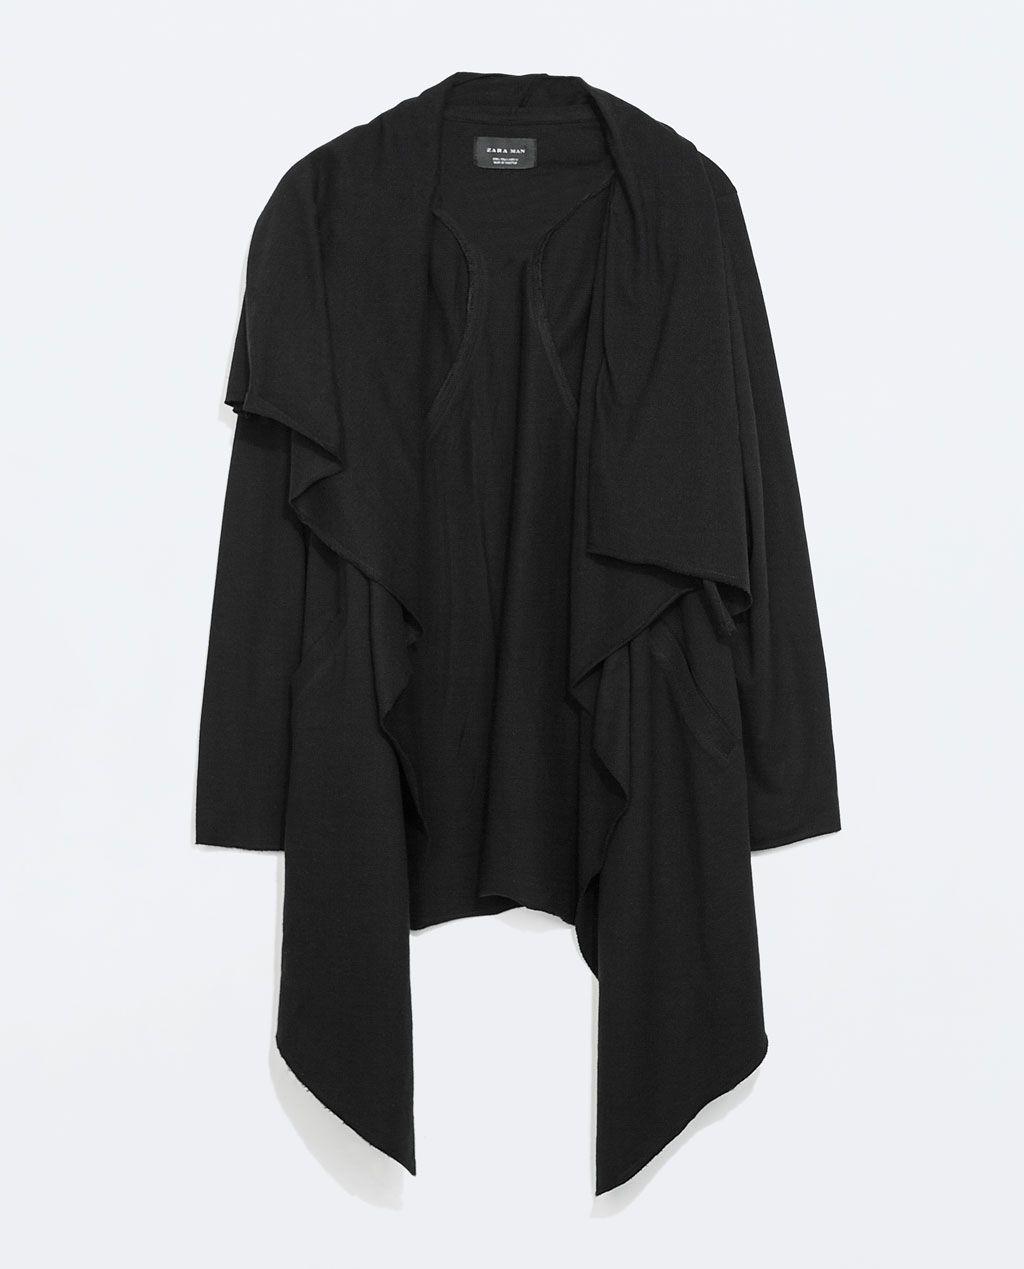 Mens black leather gloves debenhams - Zara Homem Capa Com Fechos Ecler Dark